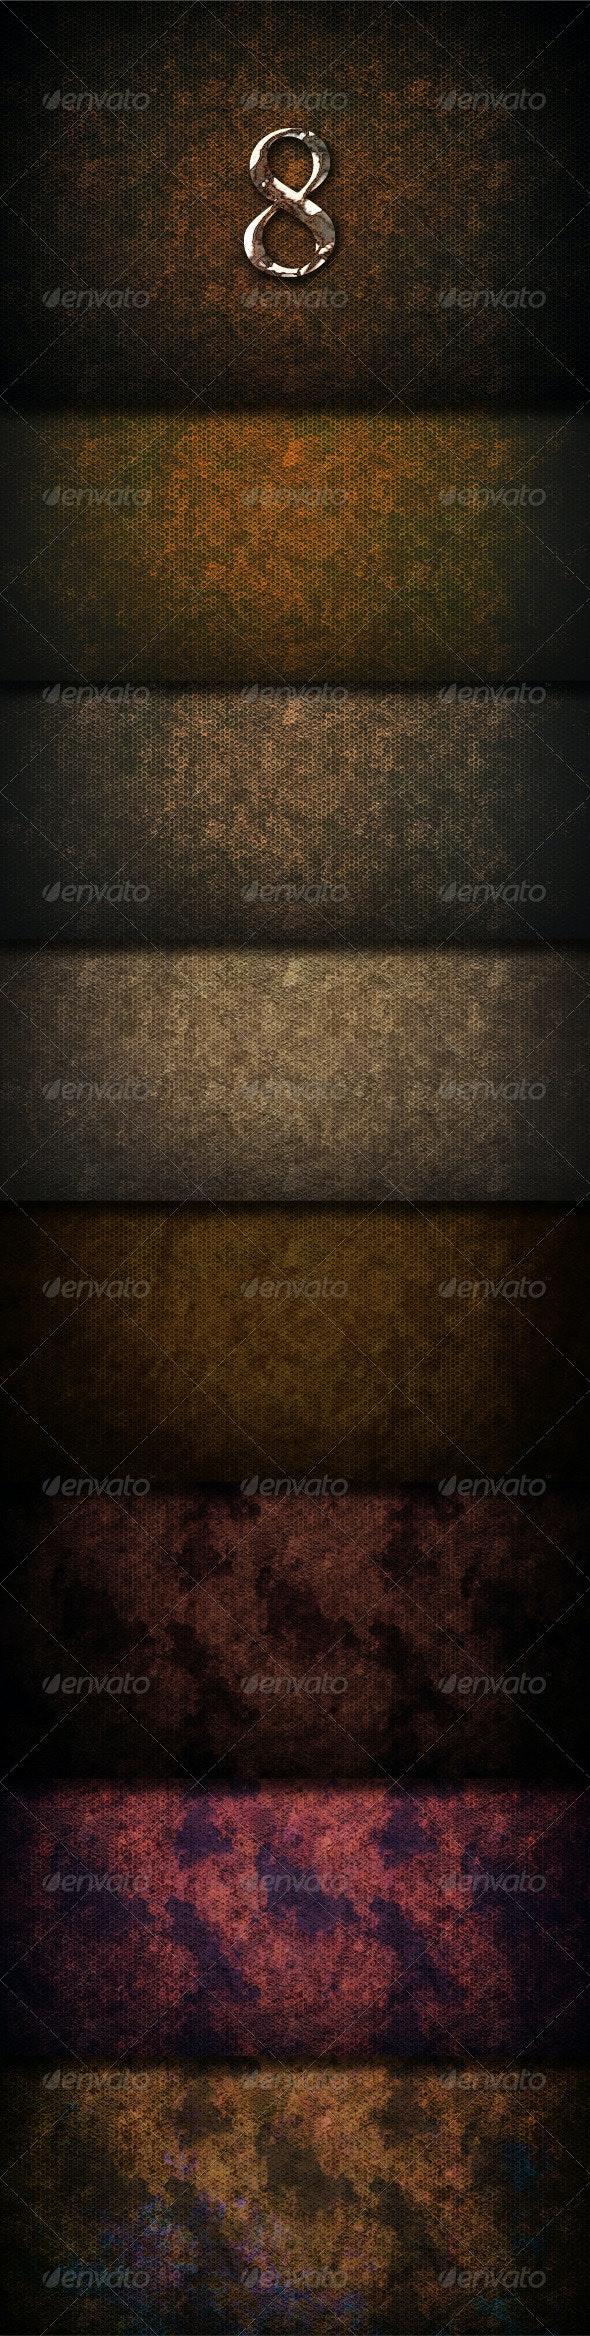 Carbon Grunge Texture Pack/backgroud  - Patterns Backgrounds